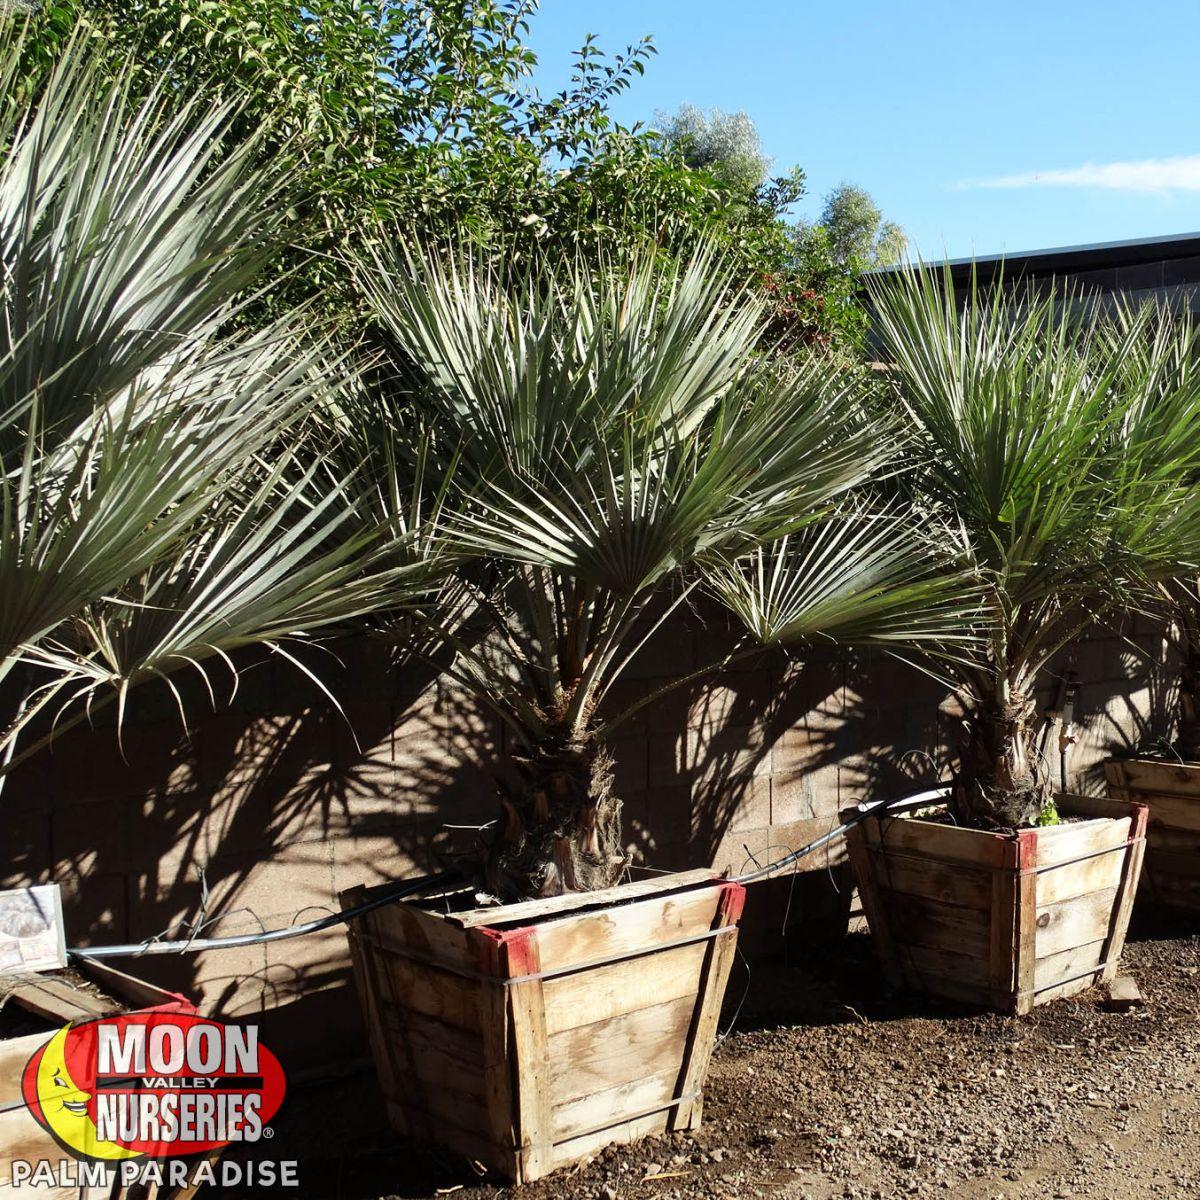 Mexican Blue Fan Palm Palm Tree Palm Paradise Nursery